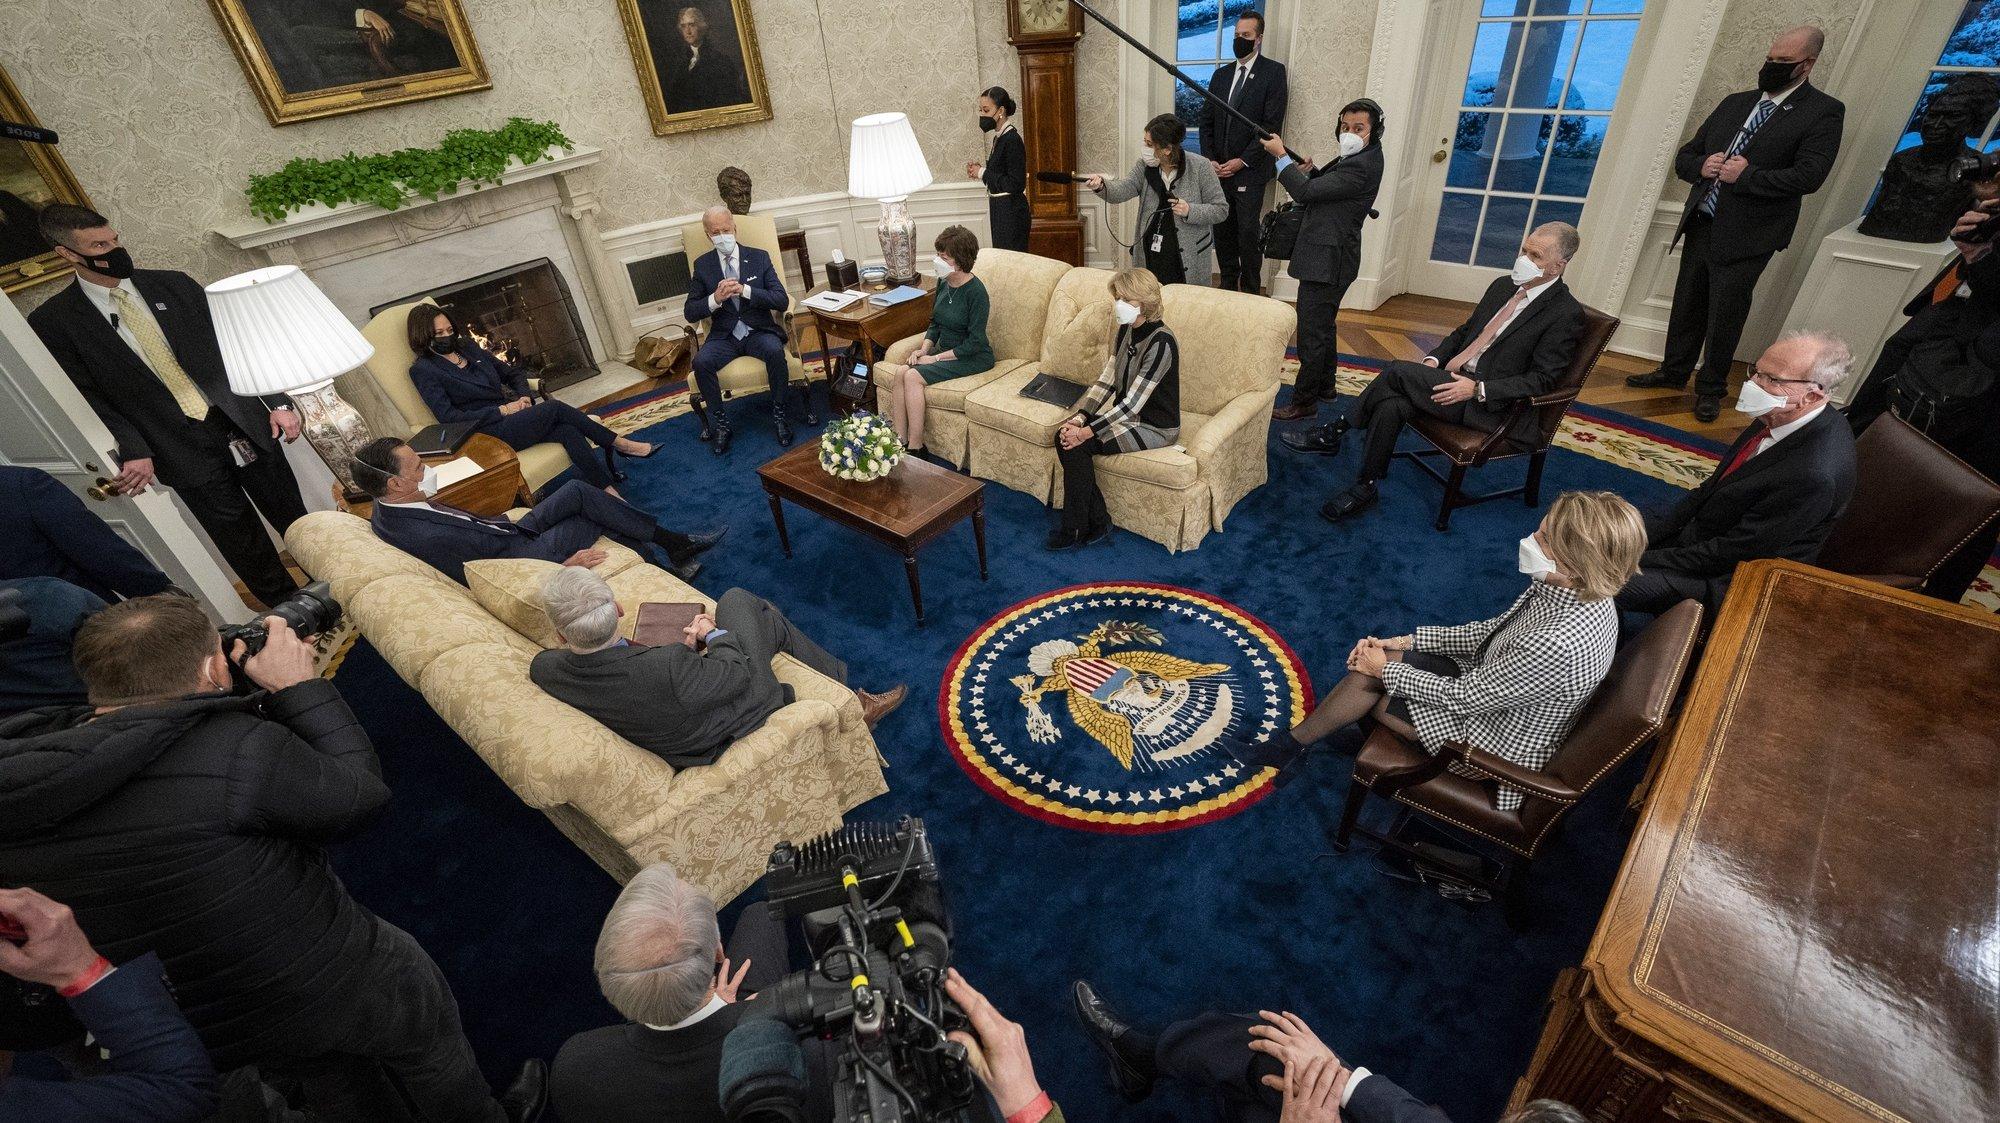 epa08980499 US President Joe Biden and Vice President Kamala Harris meet with Republican Senators about the American Rescue Plan, in the Oval Office of the White House, in Washington, DC, USA, 01 February 2021.  EPA/Doug Mills / POOL